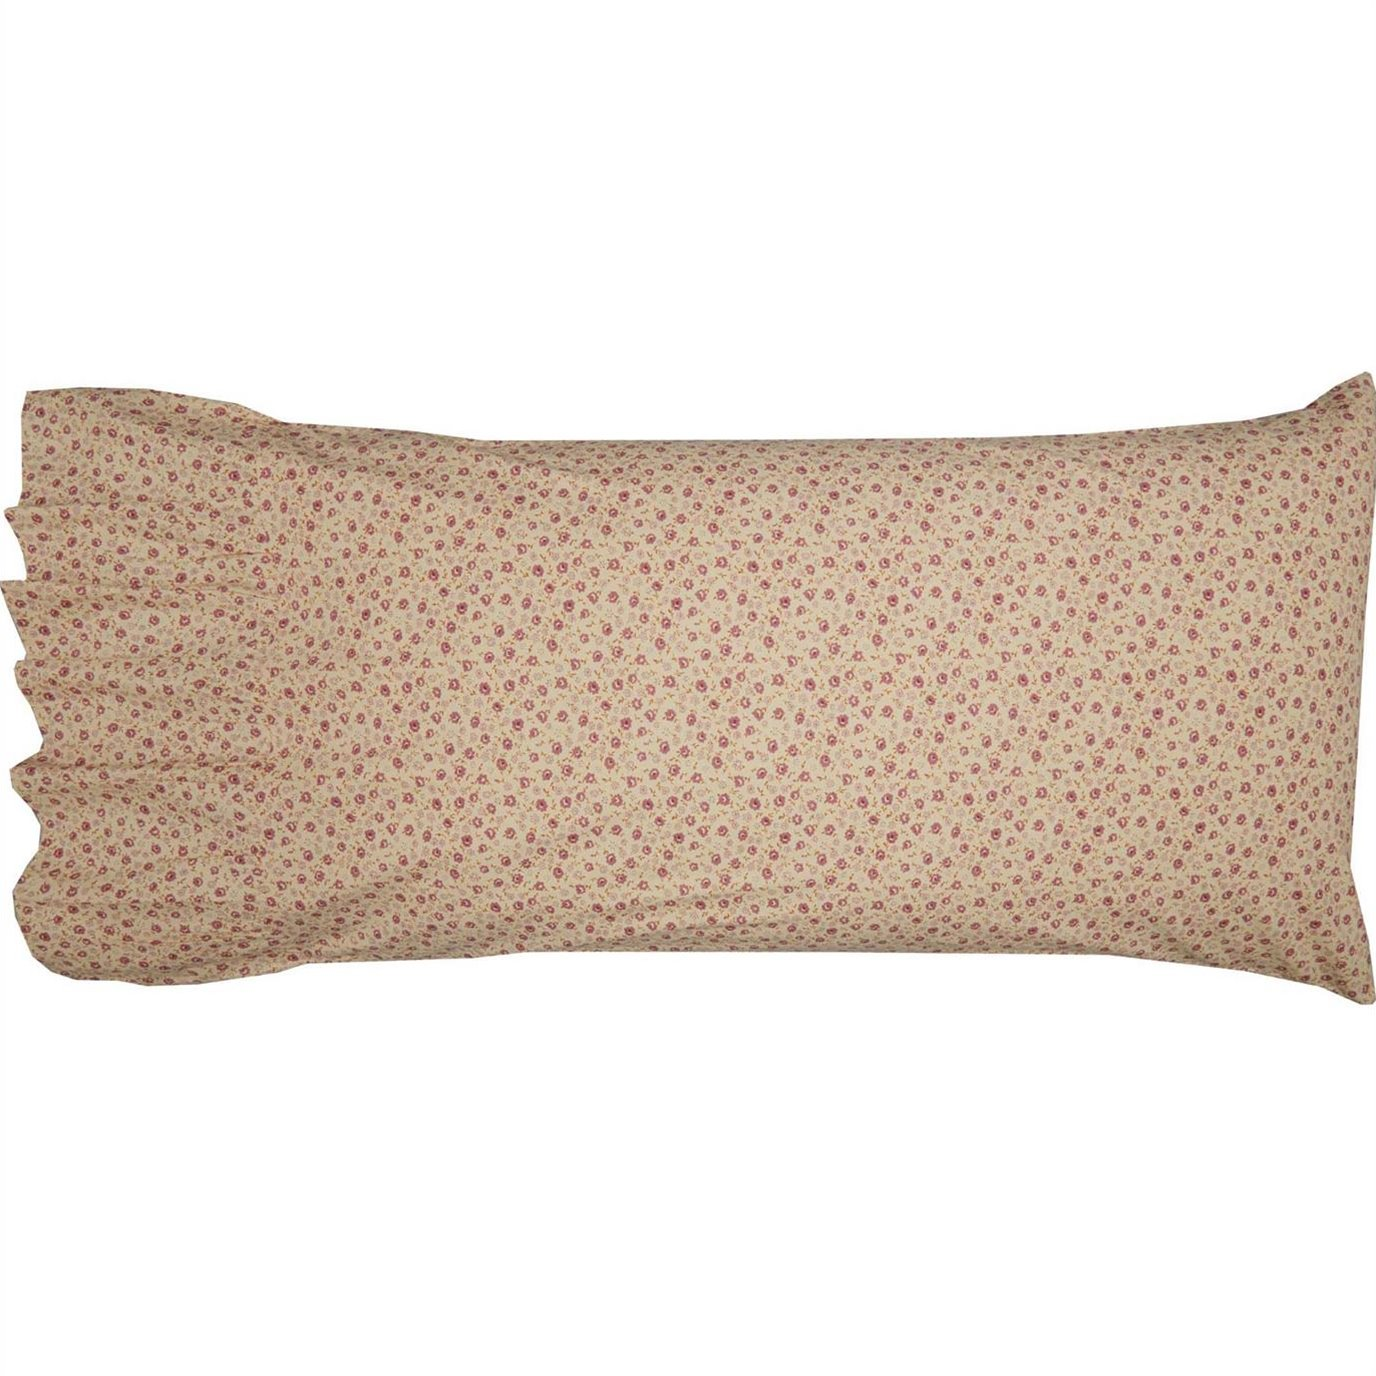 Camilia Ruffled King Pillow Case Set of 2 21x36+8